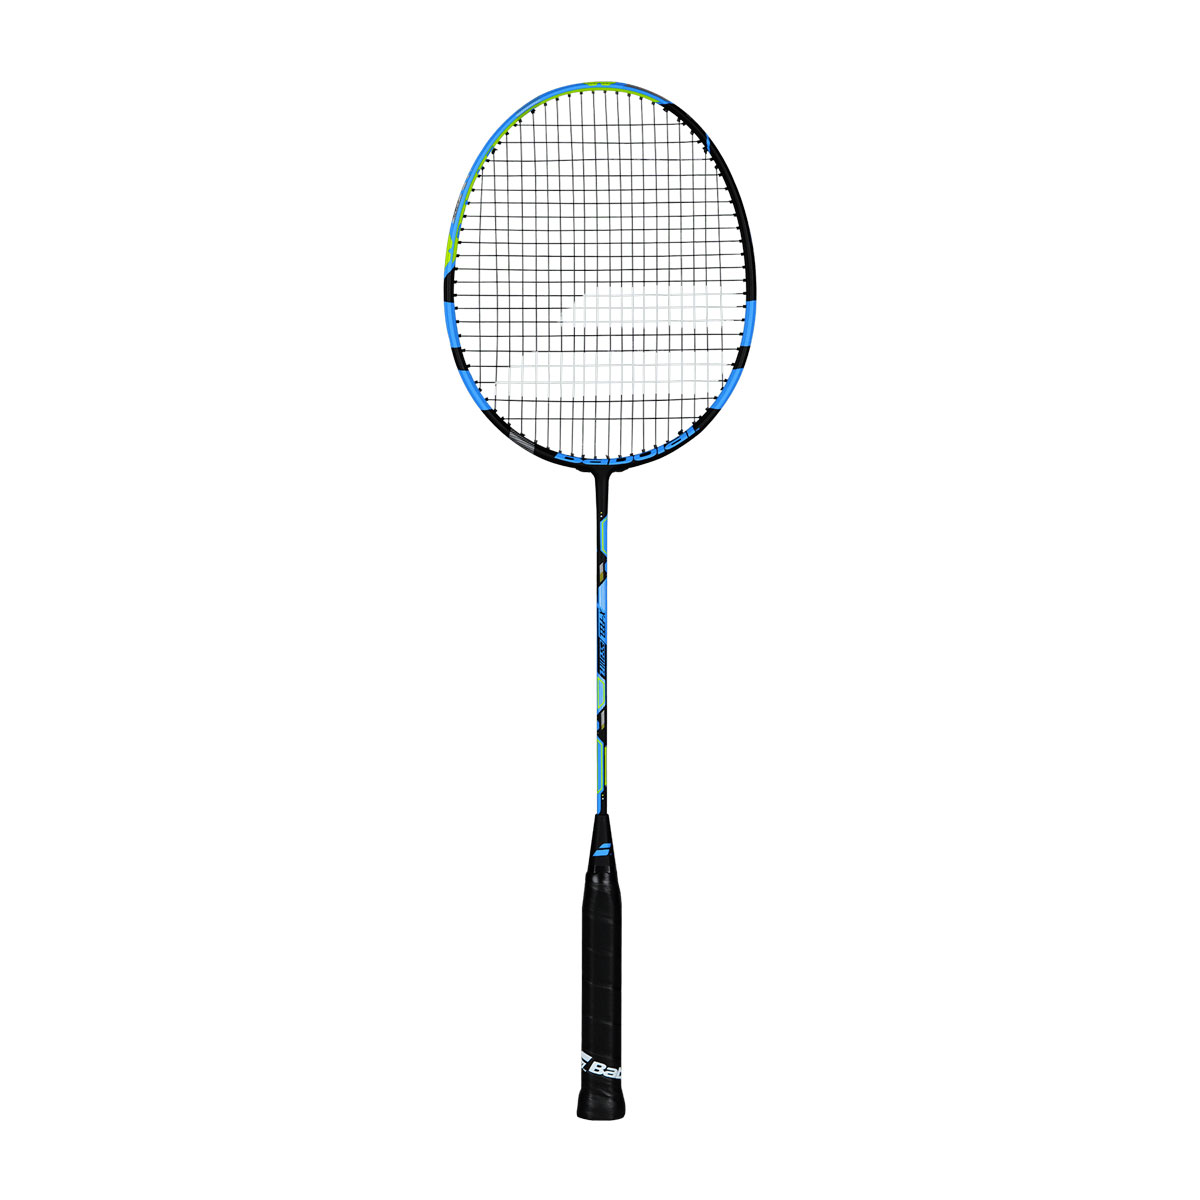 Babolat - X-Feel Essential - Badmintonschläger - unbesaitetDetailbild - 0